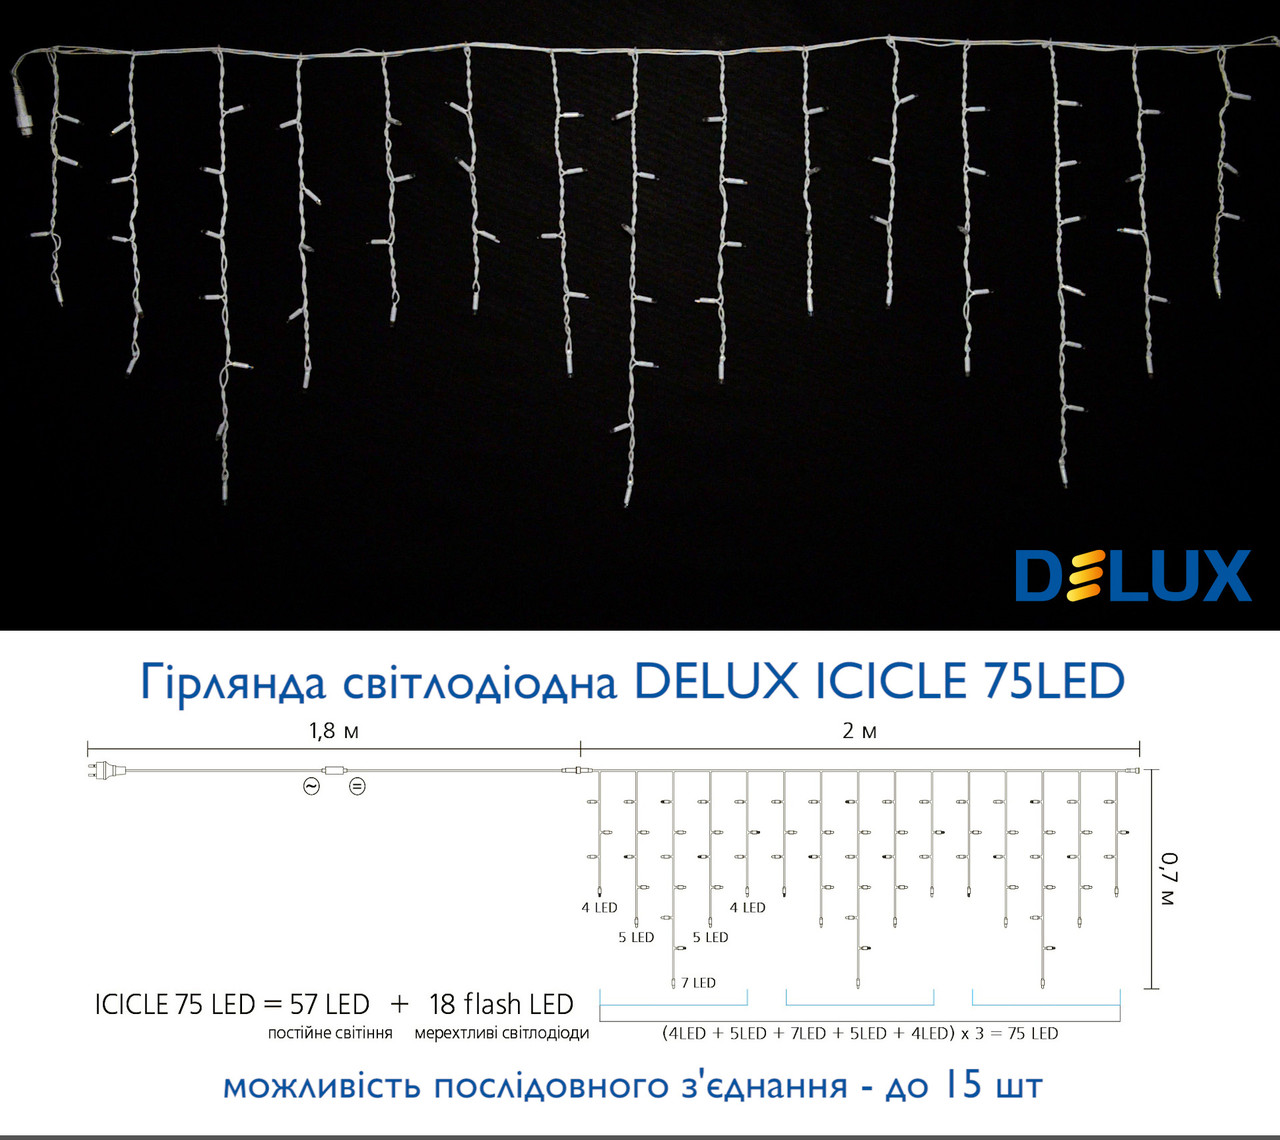 Гирлянда уличная DELUX ICICLE 75LED 2x0.7m 18 flash желт/бел IP44 EN